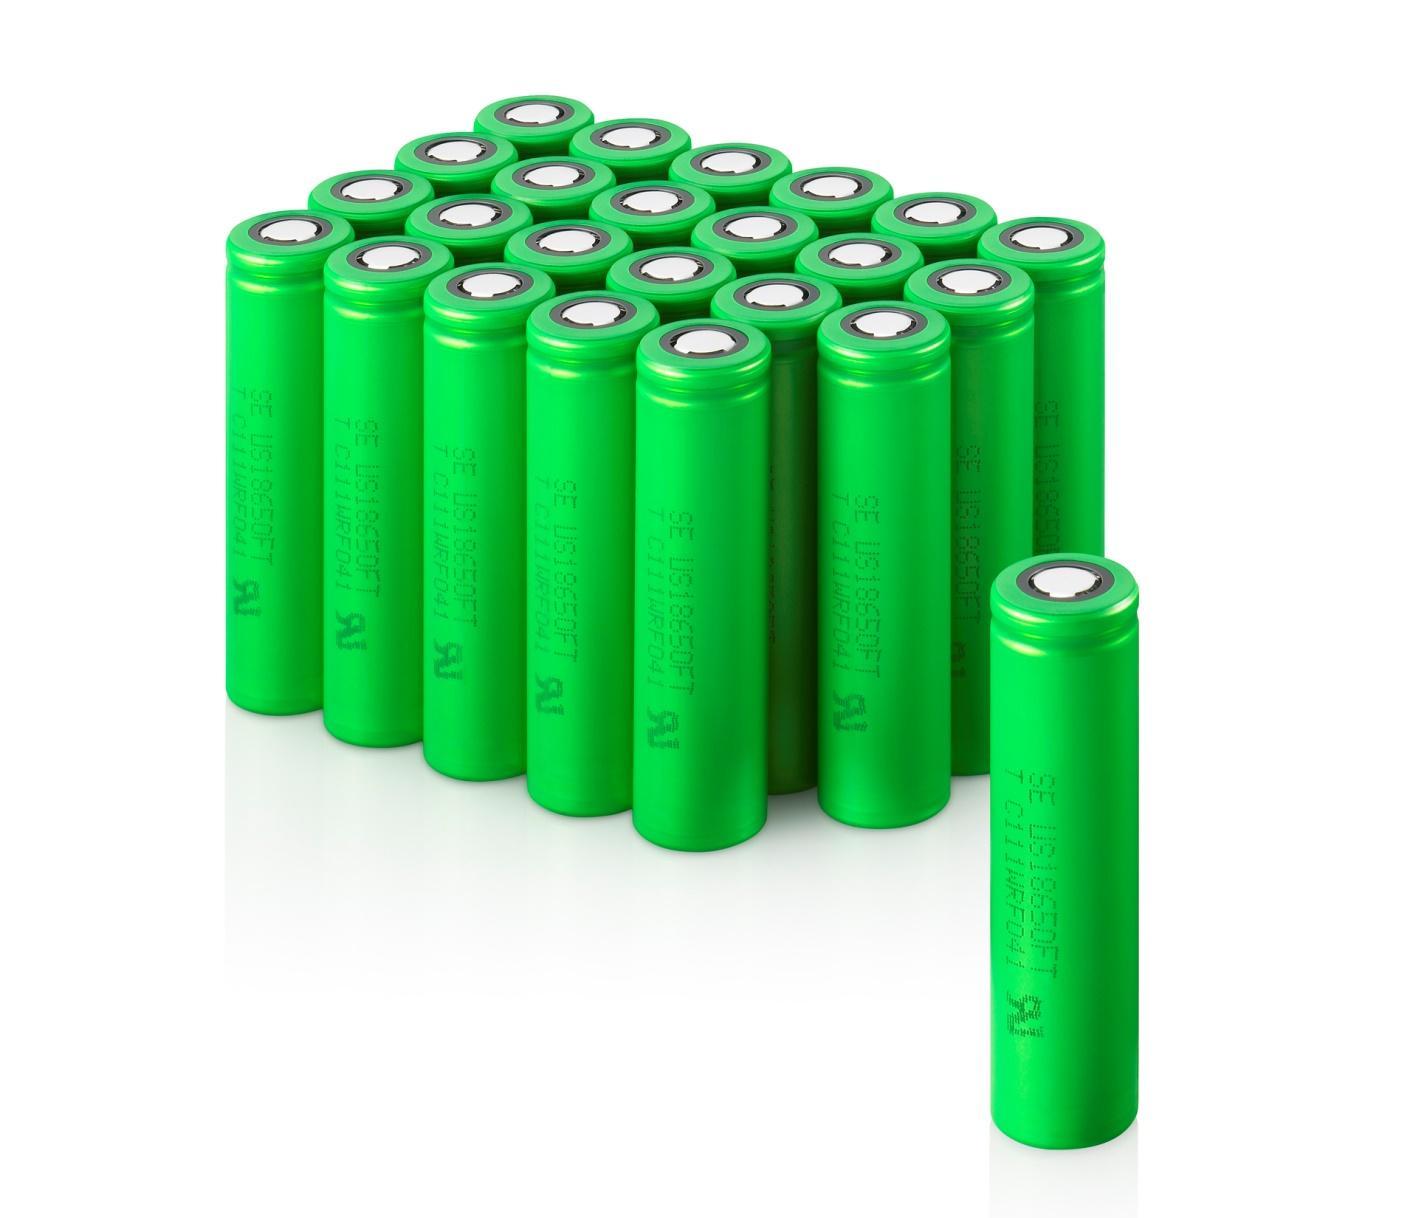 Смена аккумуляторов: ИБП на технологии Li-Ion